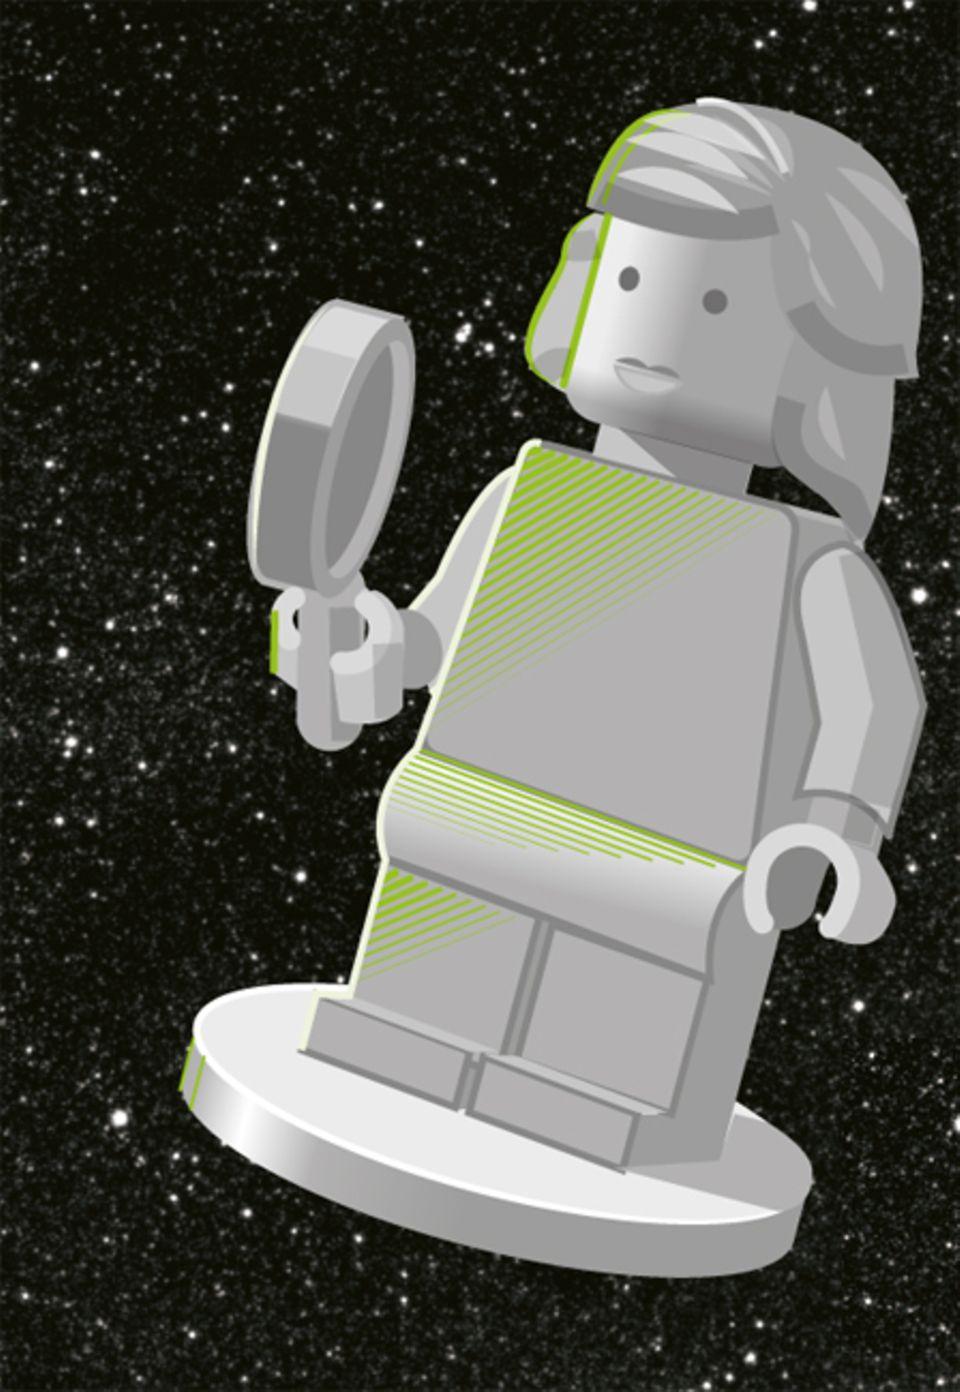 Weltall: Raumsonde Juno brachte 3 Lego-Figuren ins All